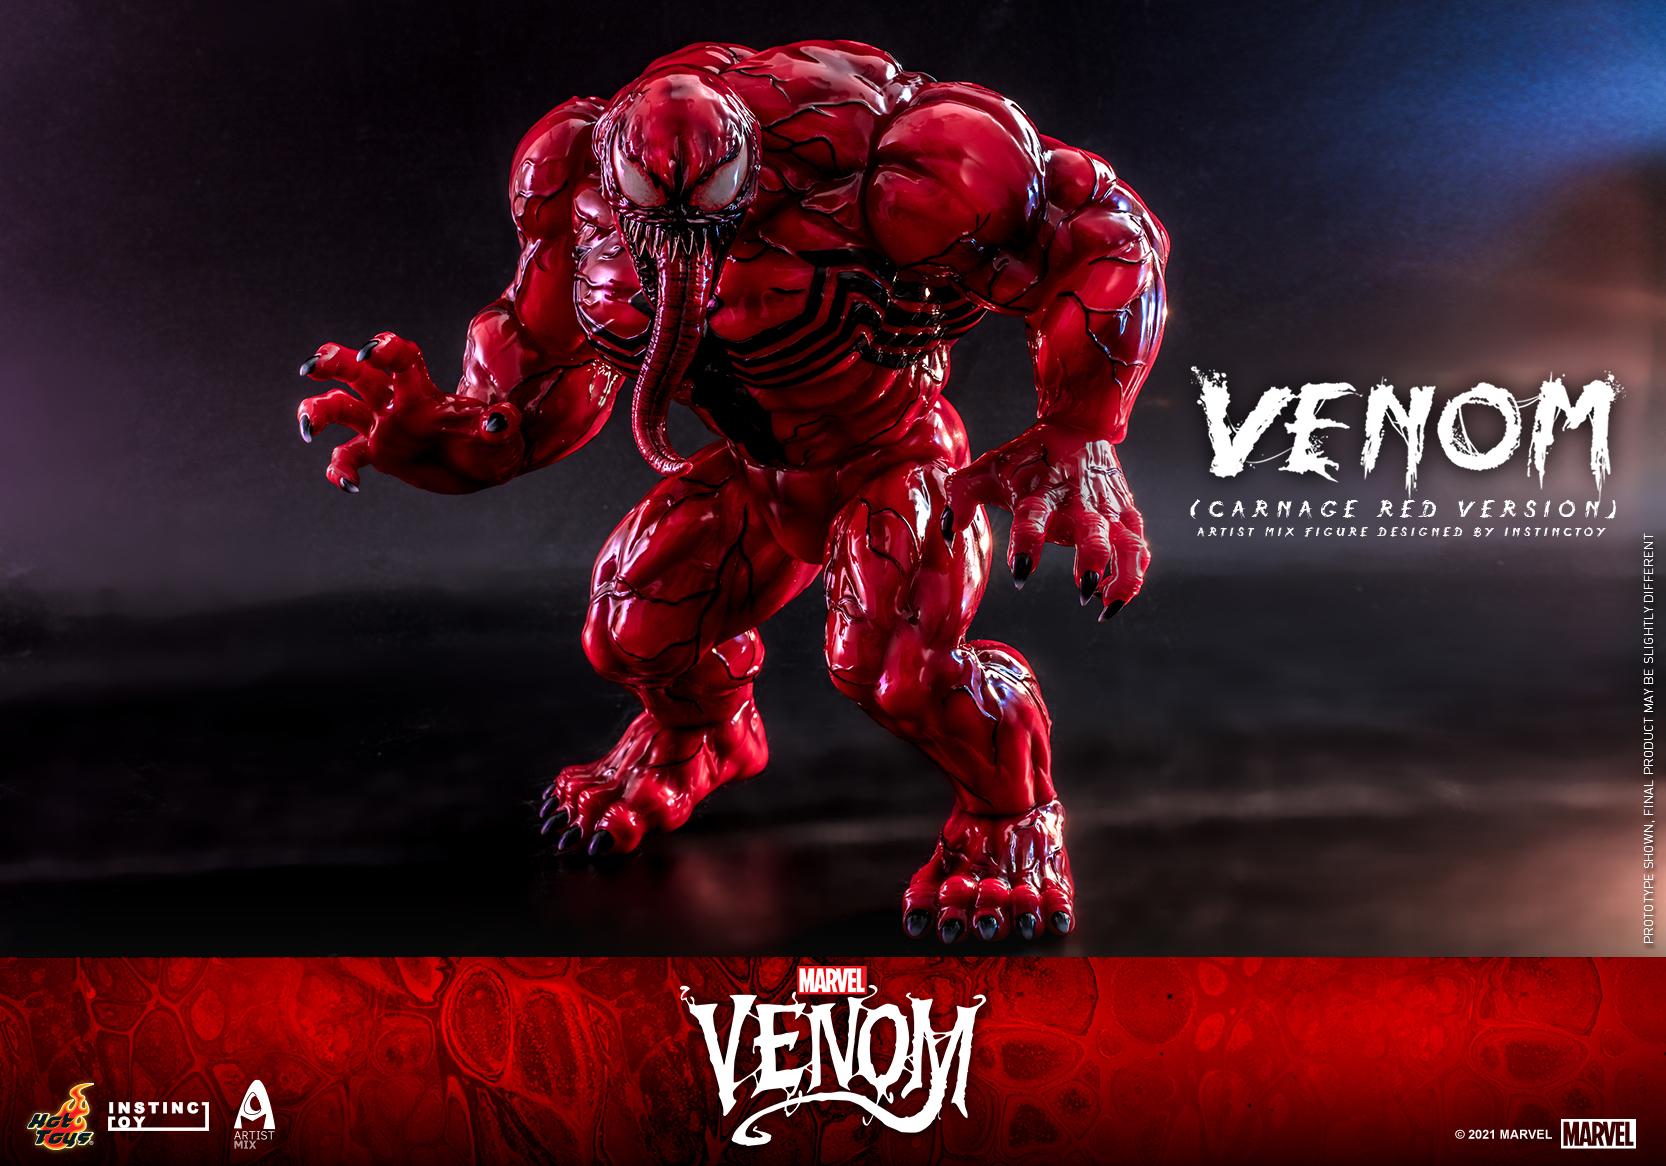 Hot Toys - Venom (Carnage Red Version) Artist Mix Figure Designed by Instinctoy_PR5